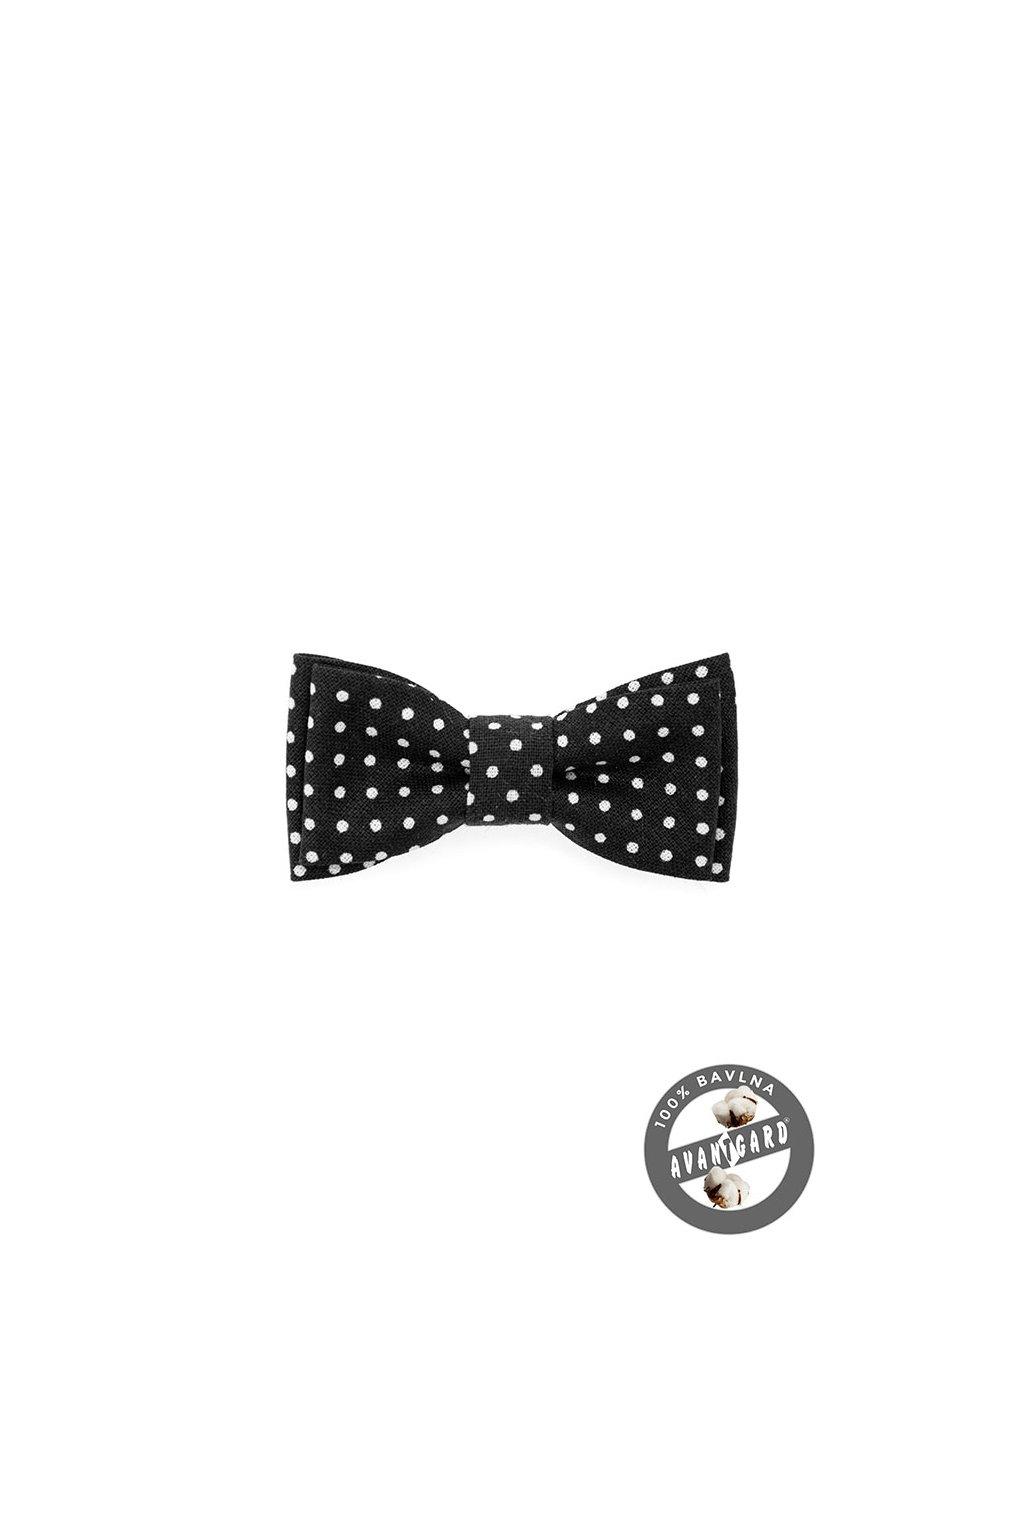 Motýlek MINI černá s bílým puntíkem 531 - 5120